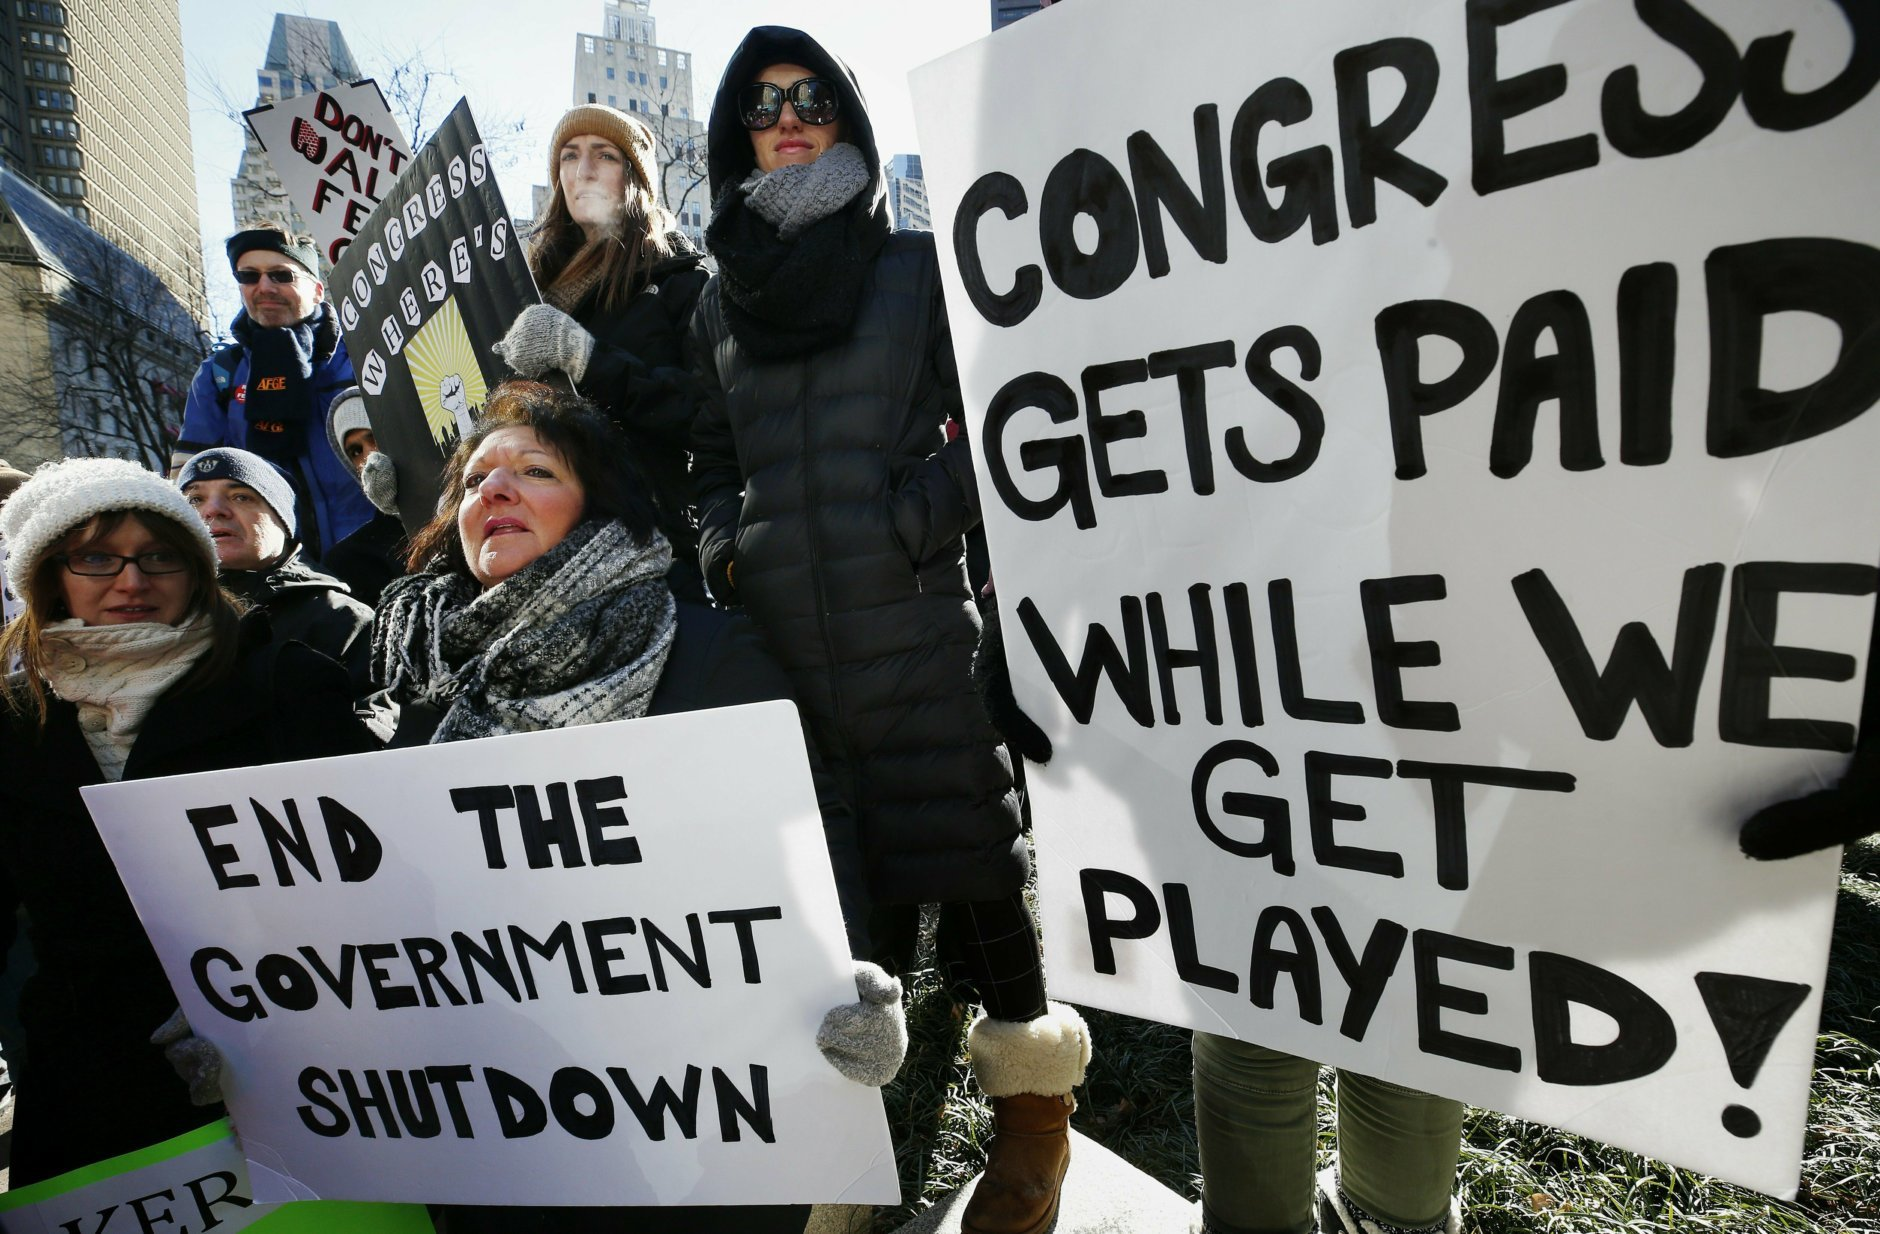 Shutdown: Congress shouldn't get paid during standoff, Va